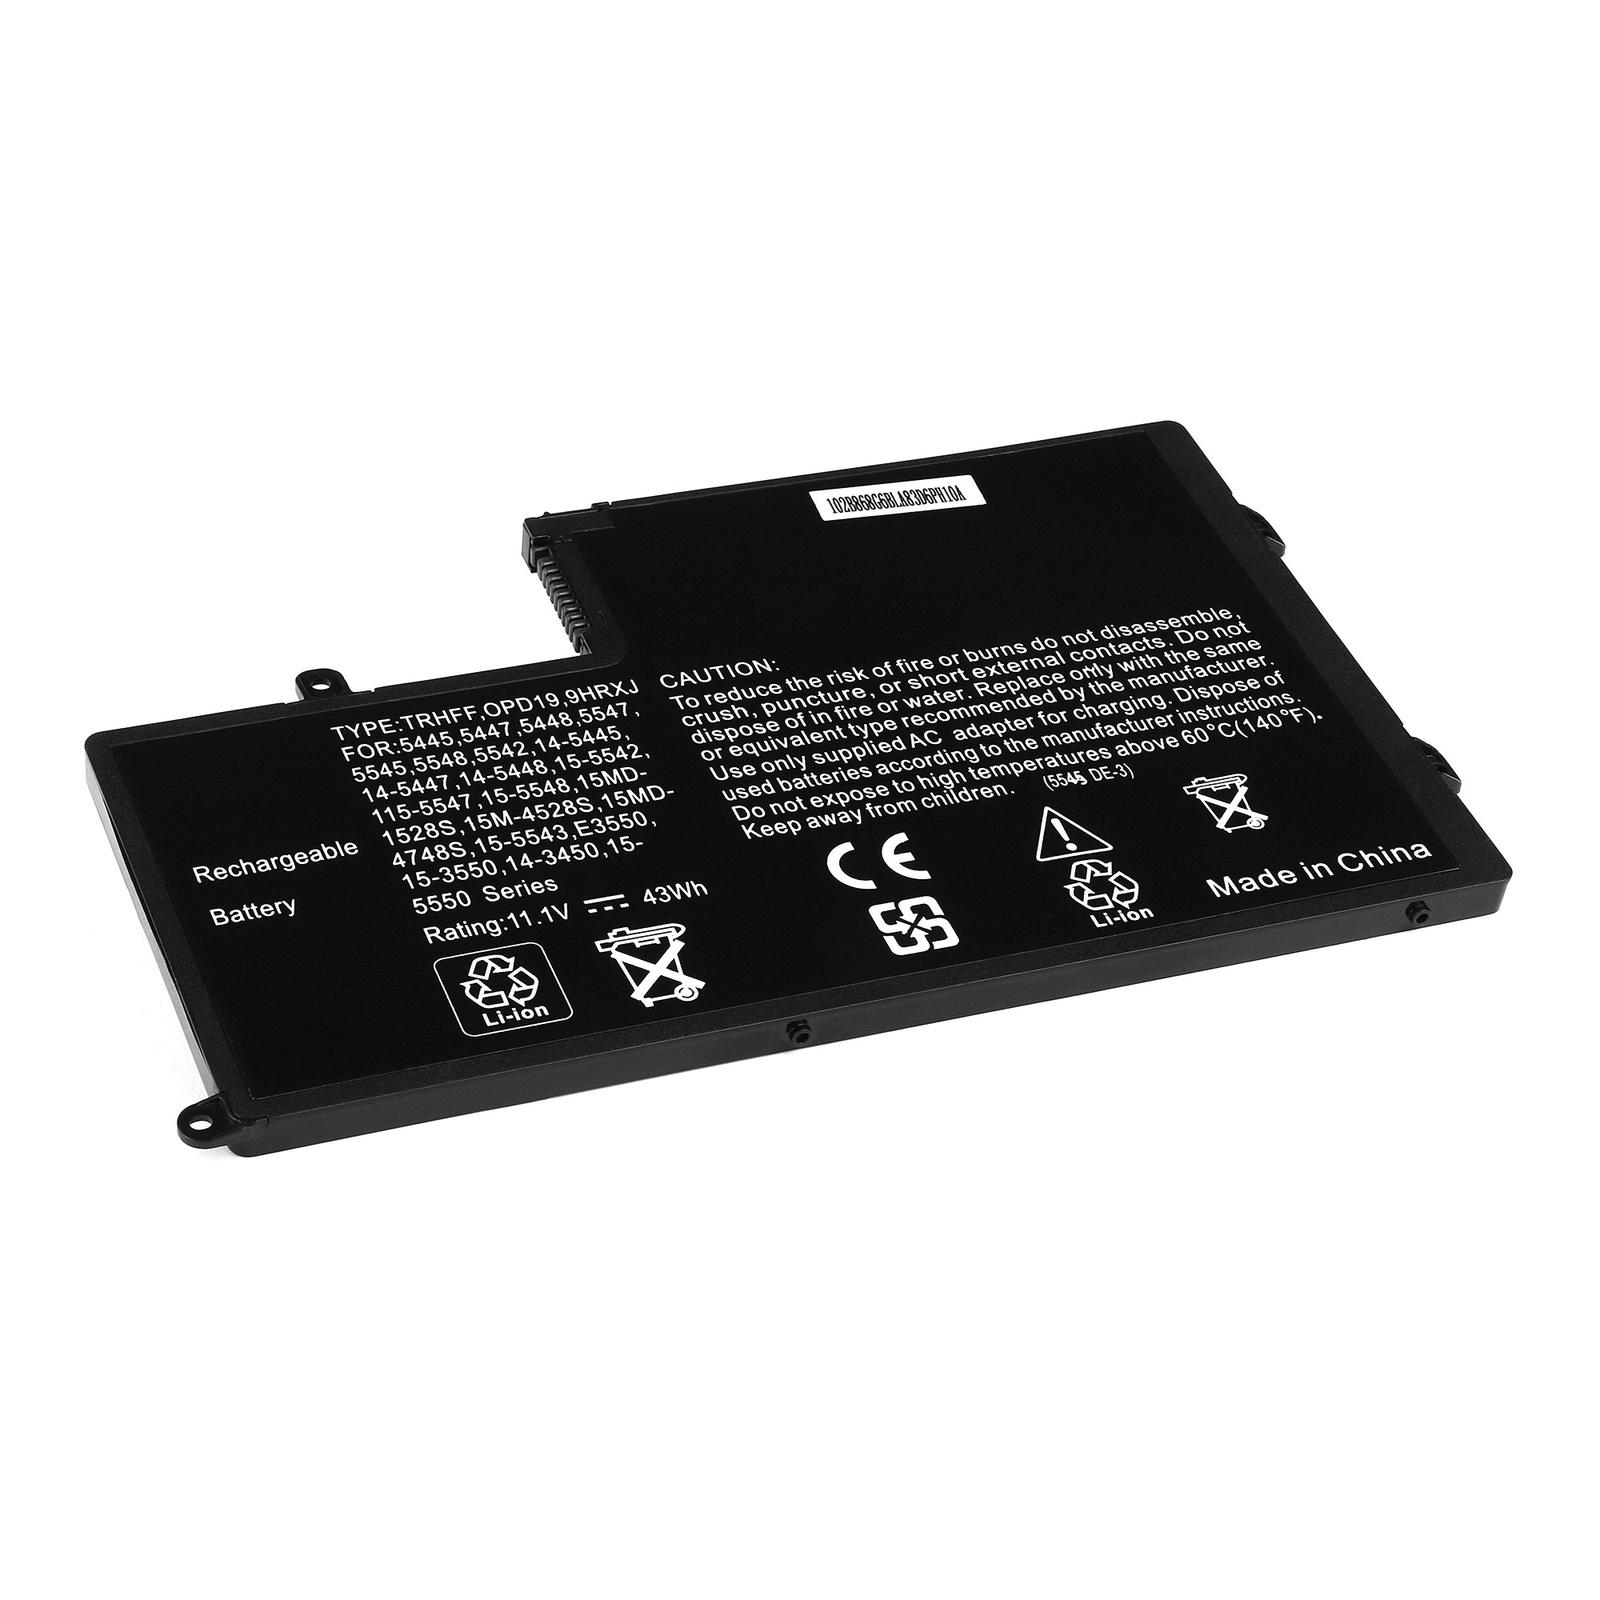 Аккумулятор для ноутбука OEM Dell Inspiron 15-5000 Series.11.1V 3950mAh. аккумулятор oem 15